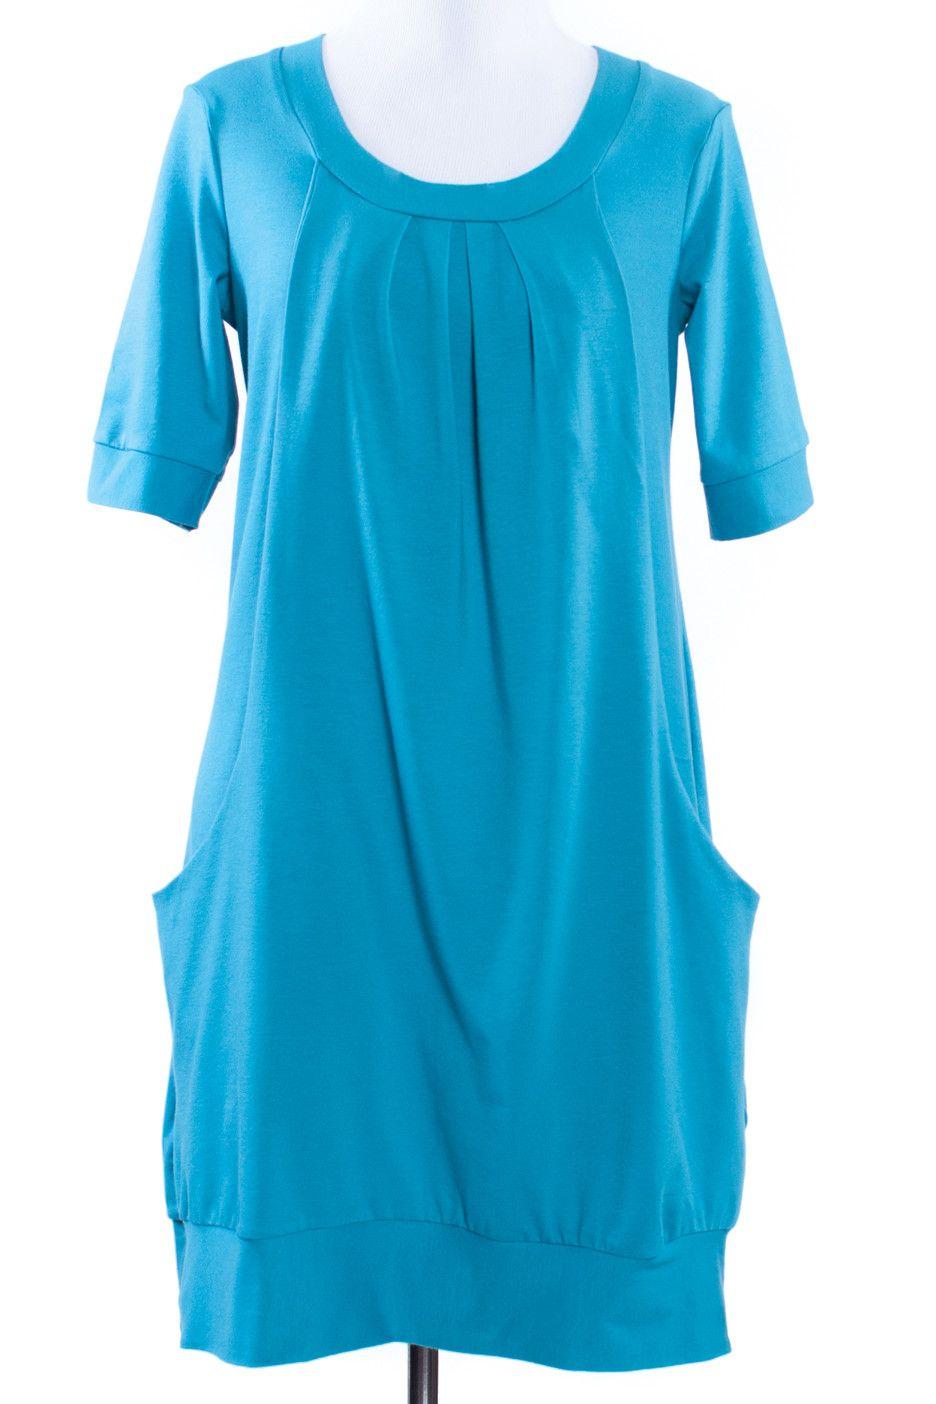 Pocketful of Posies Dress Sewing Pattern by Blank Slate Patterns ...